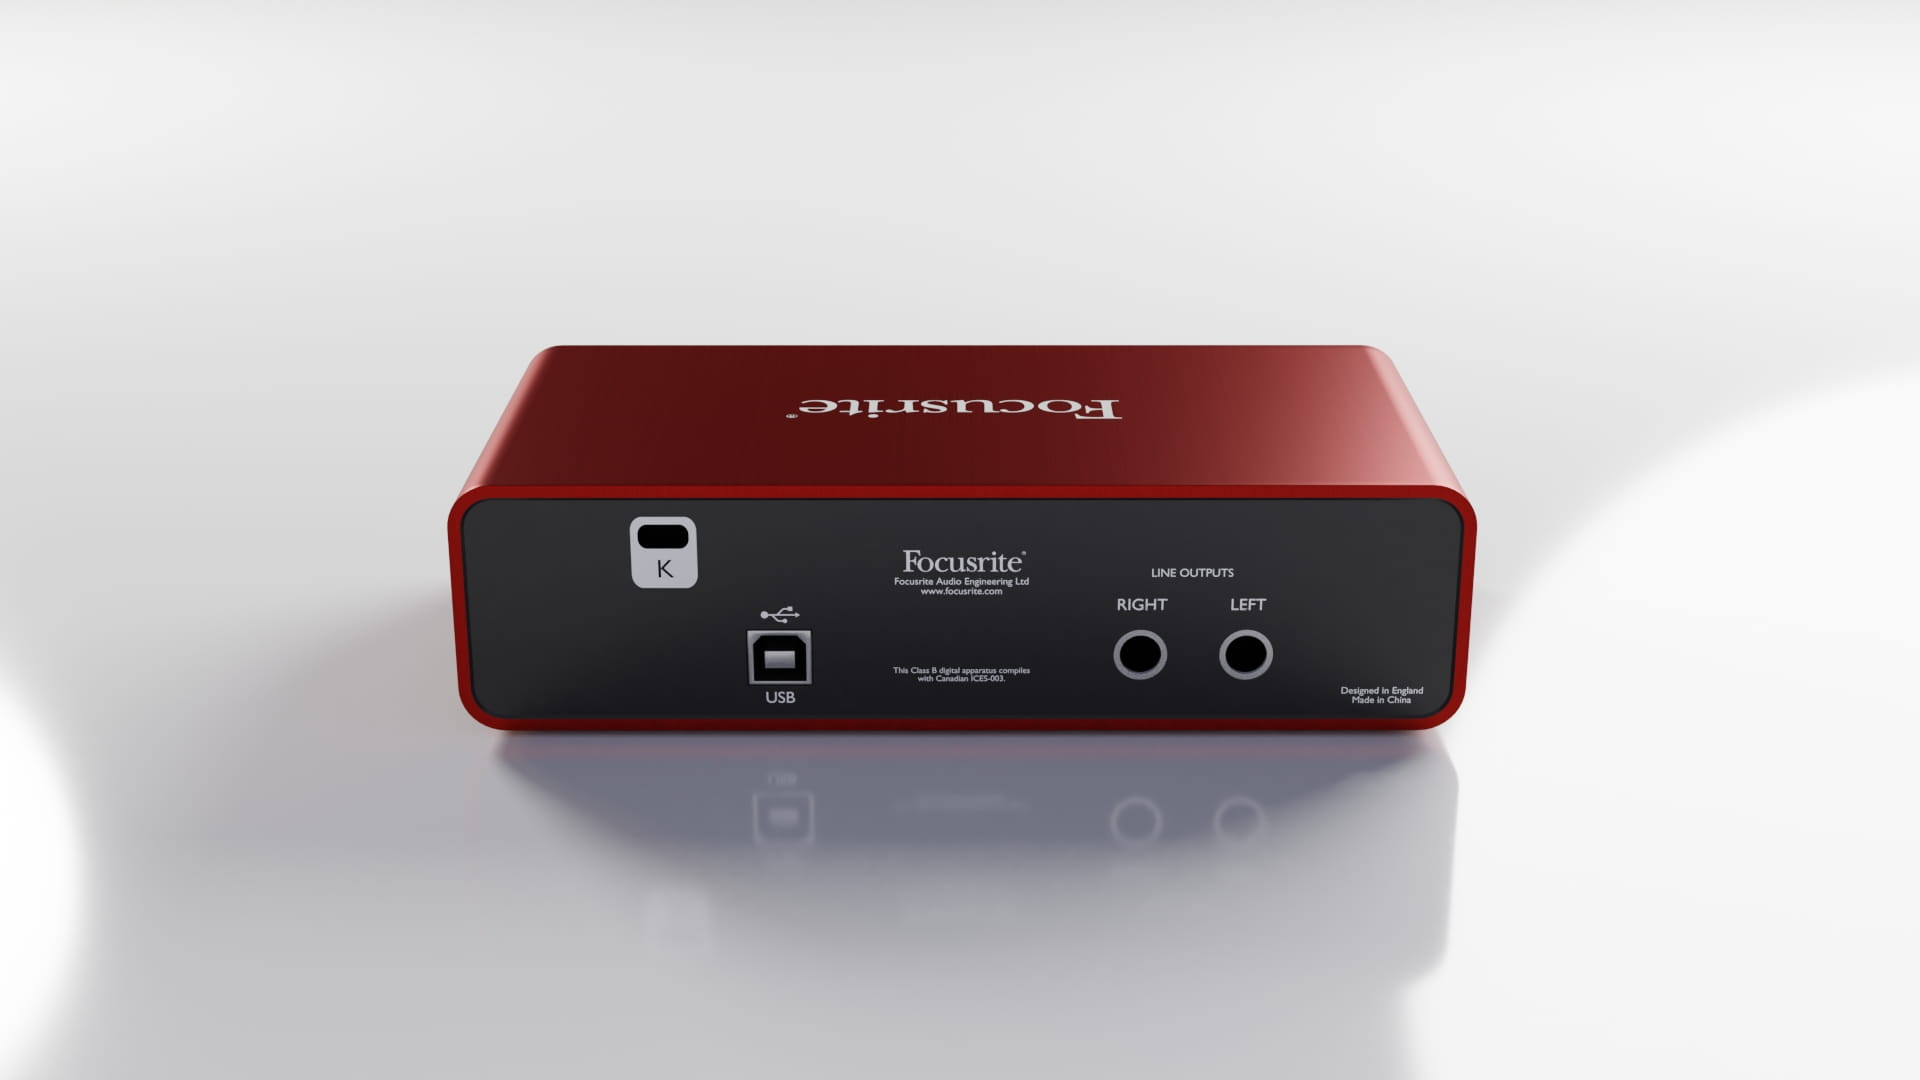 Model 3d Focusrite Scarlett 2i2 zaprojektowany w Blender 2.8 - Back